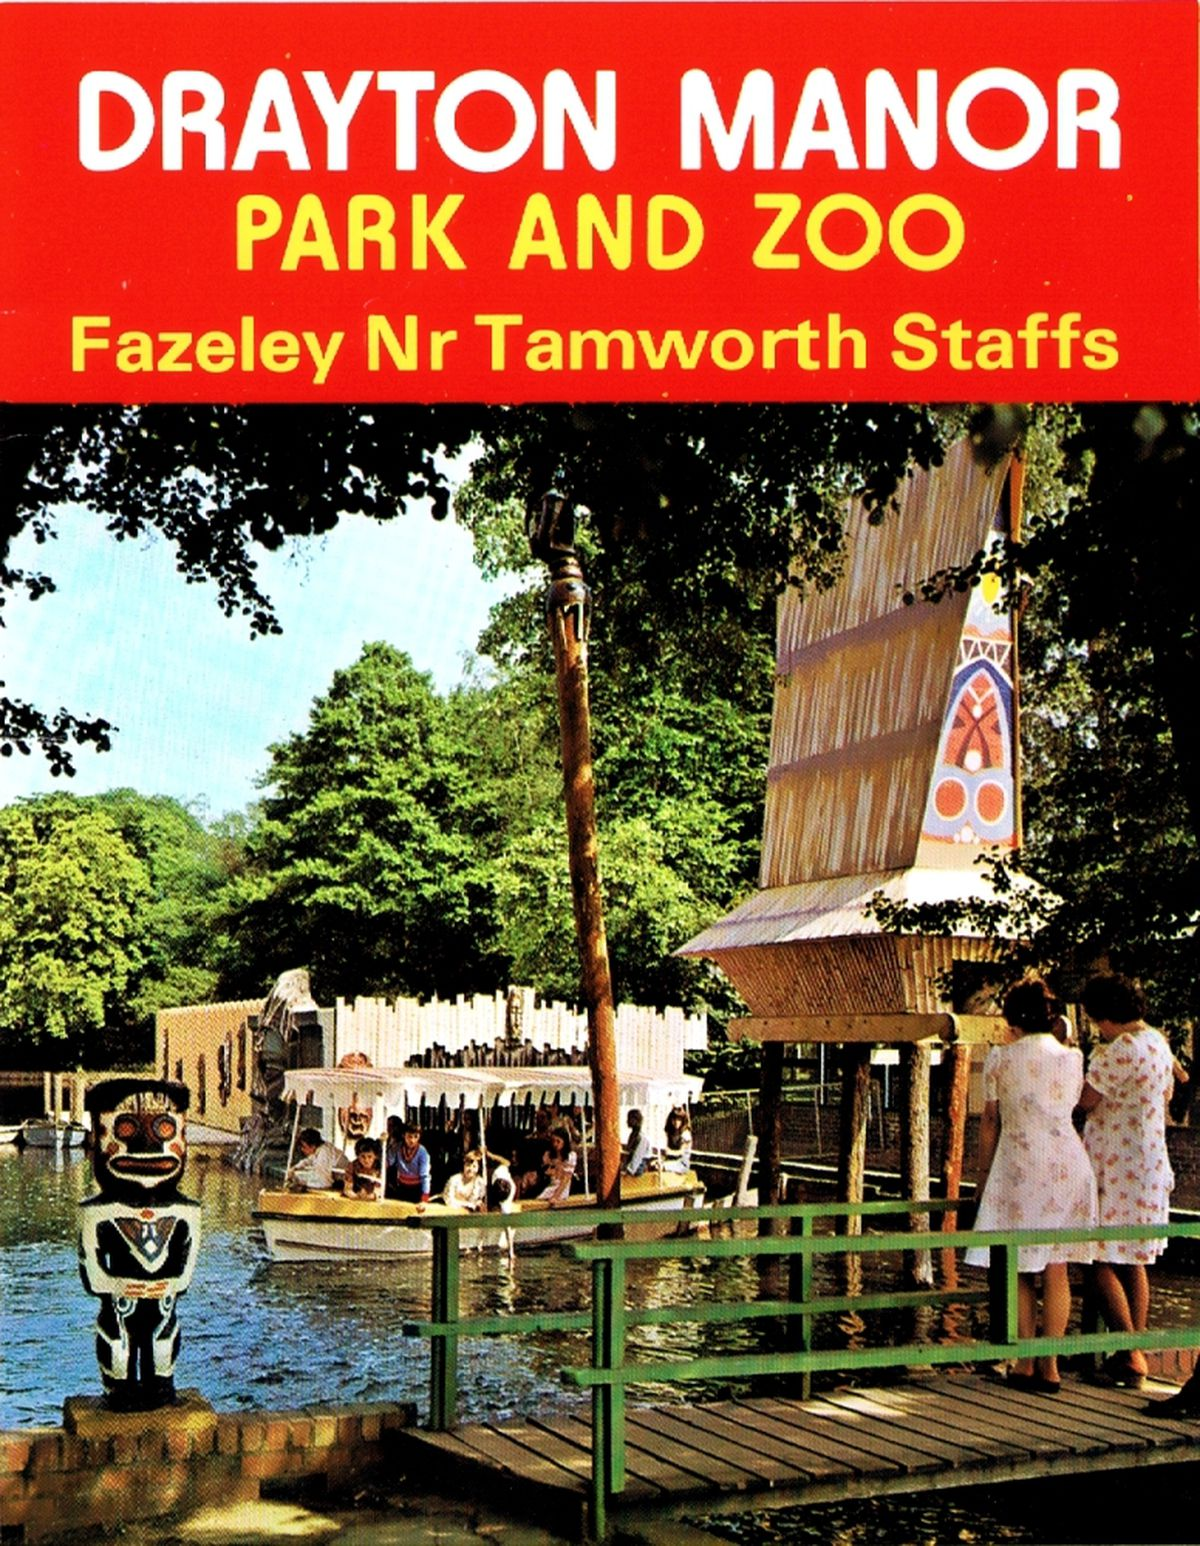 Former Drayton Manor leaflets